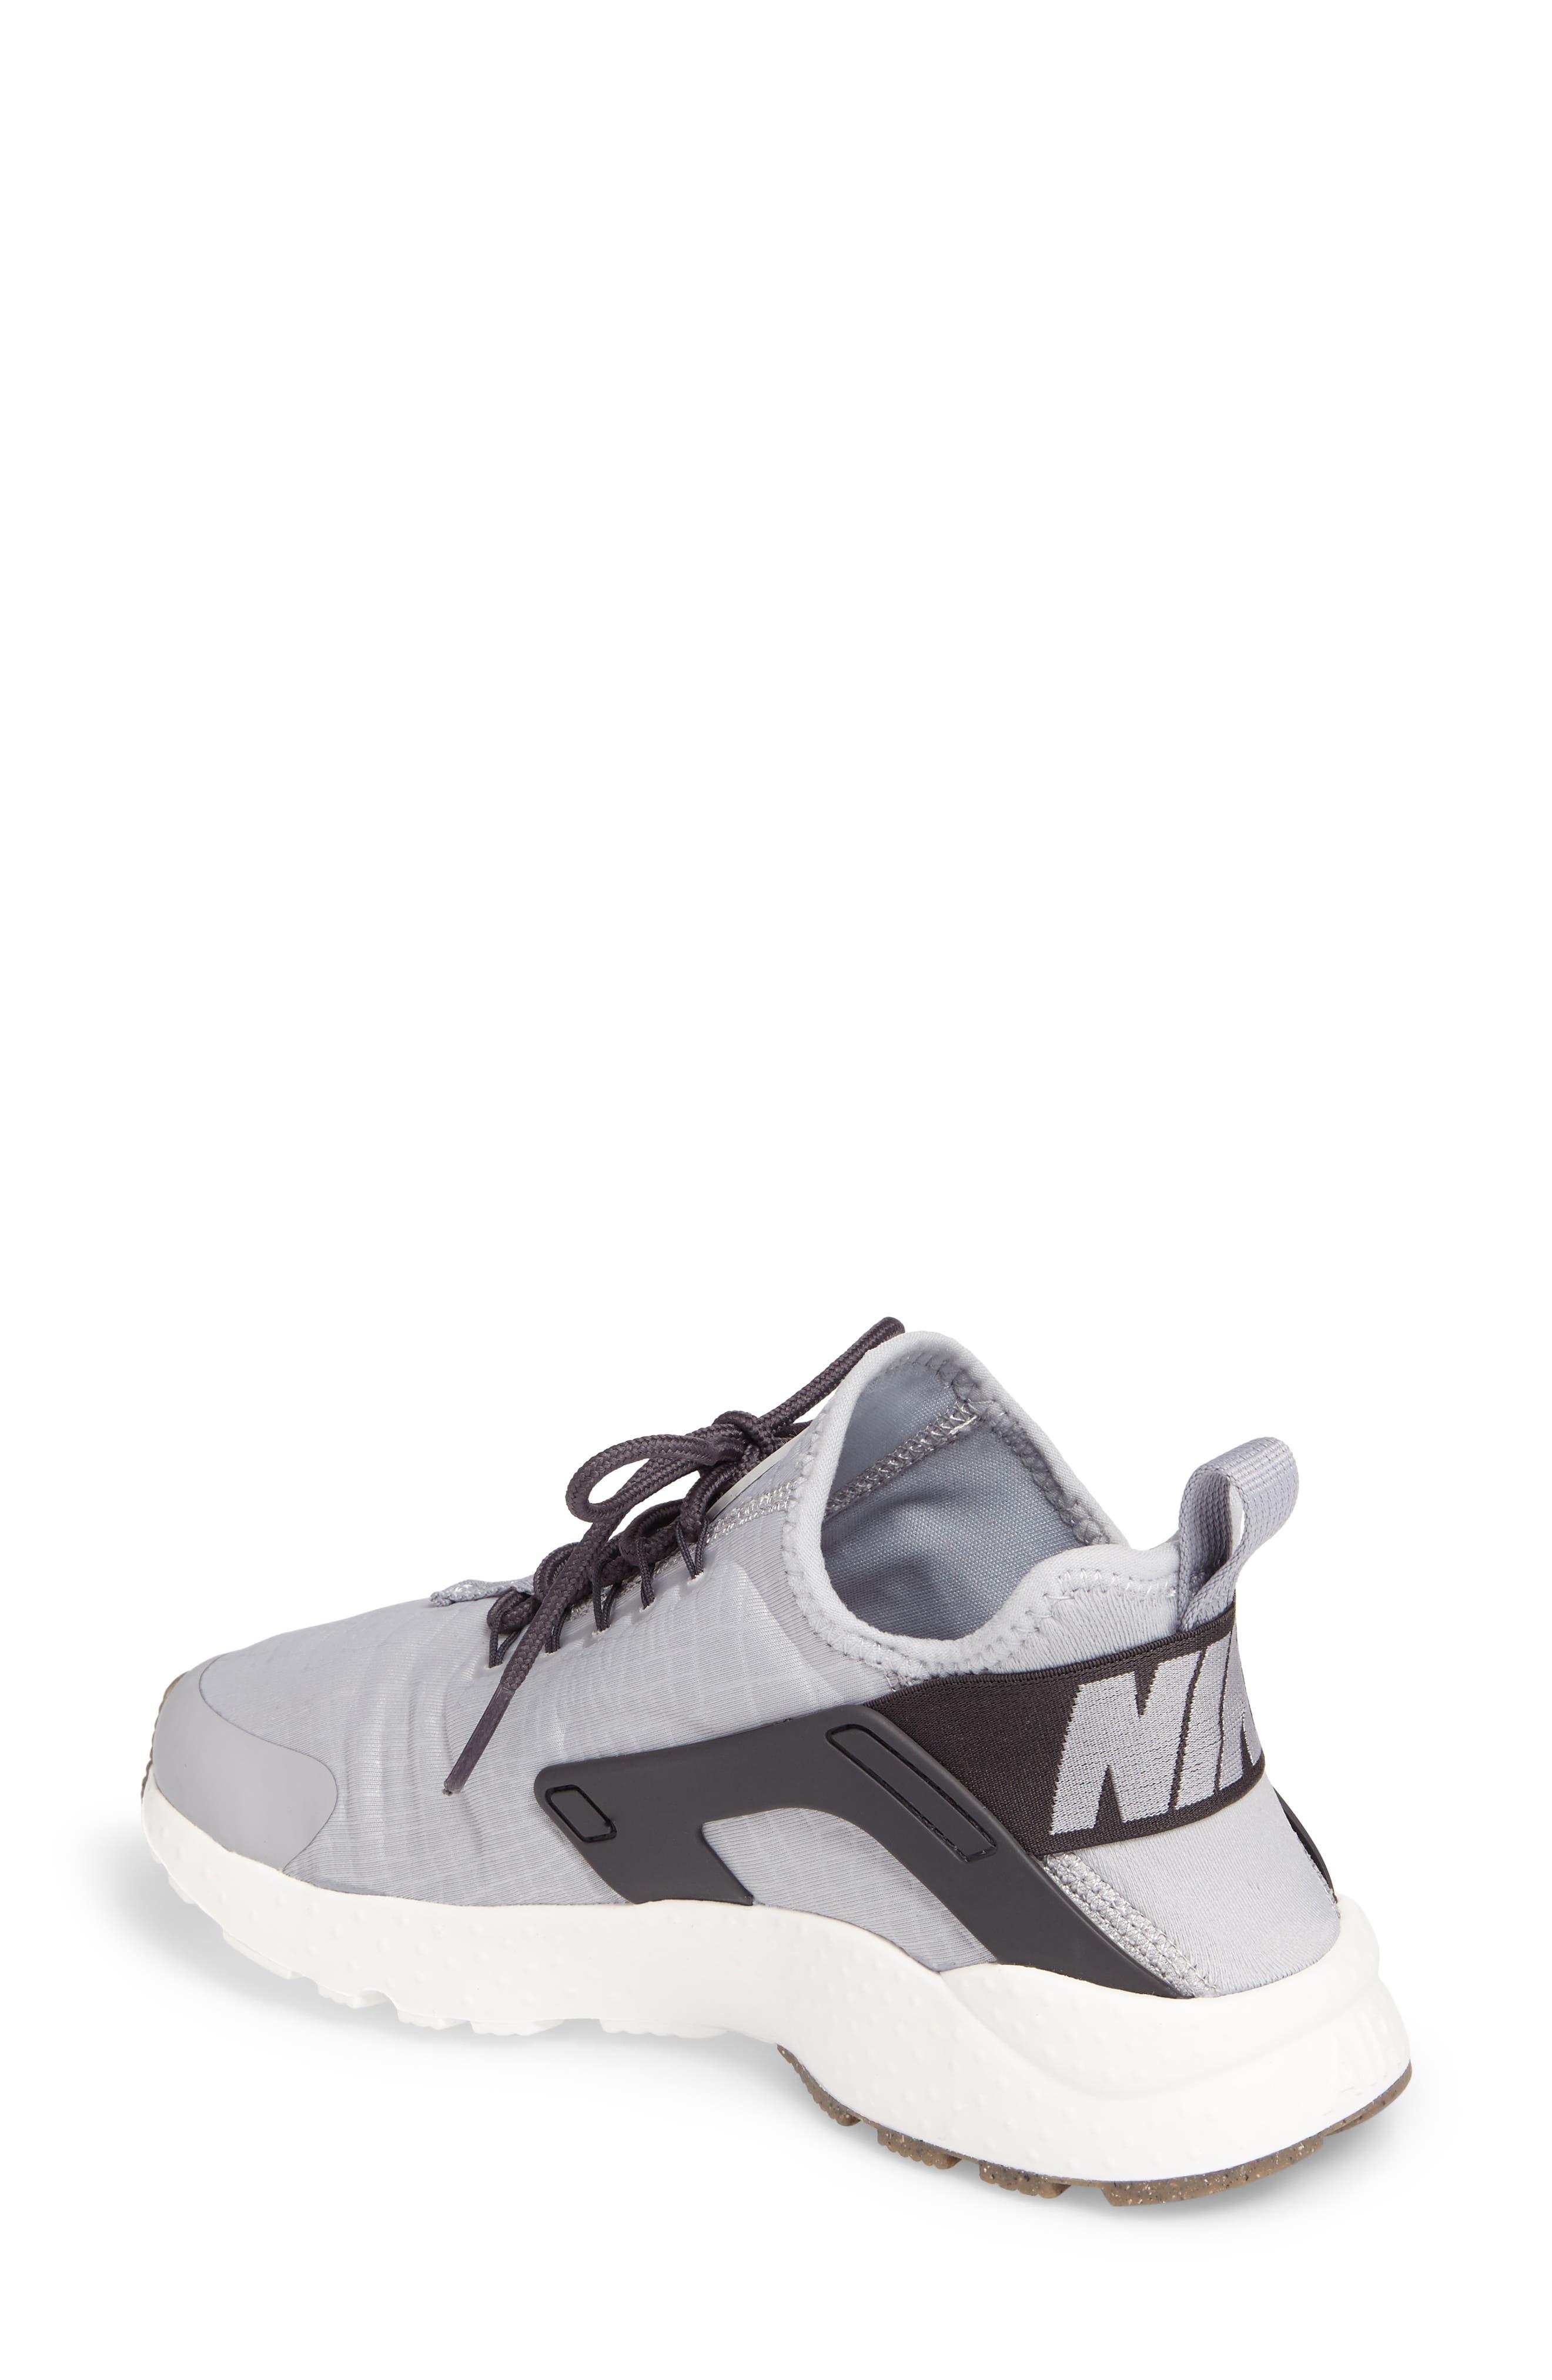 Air Huarache Sneaker,                             Alternate thumbnail 54, color,